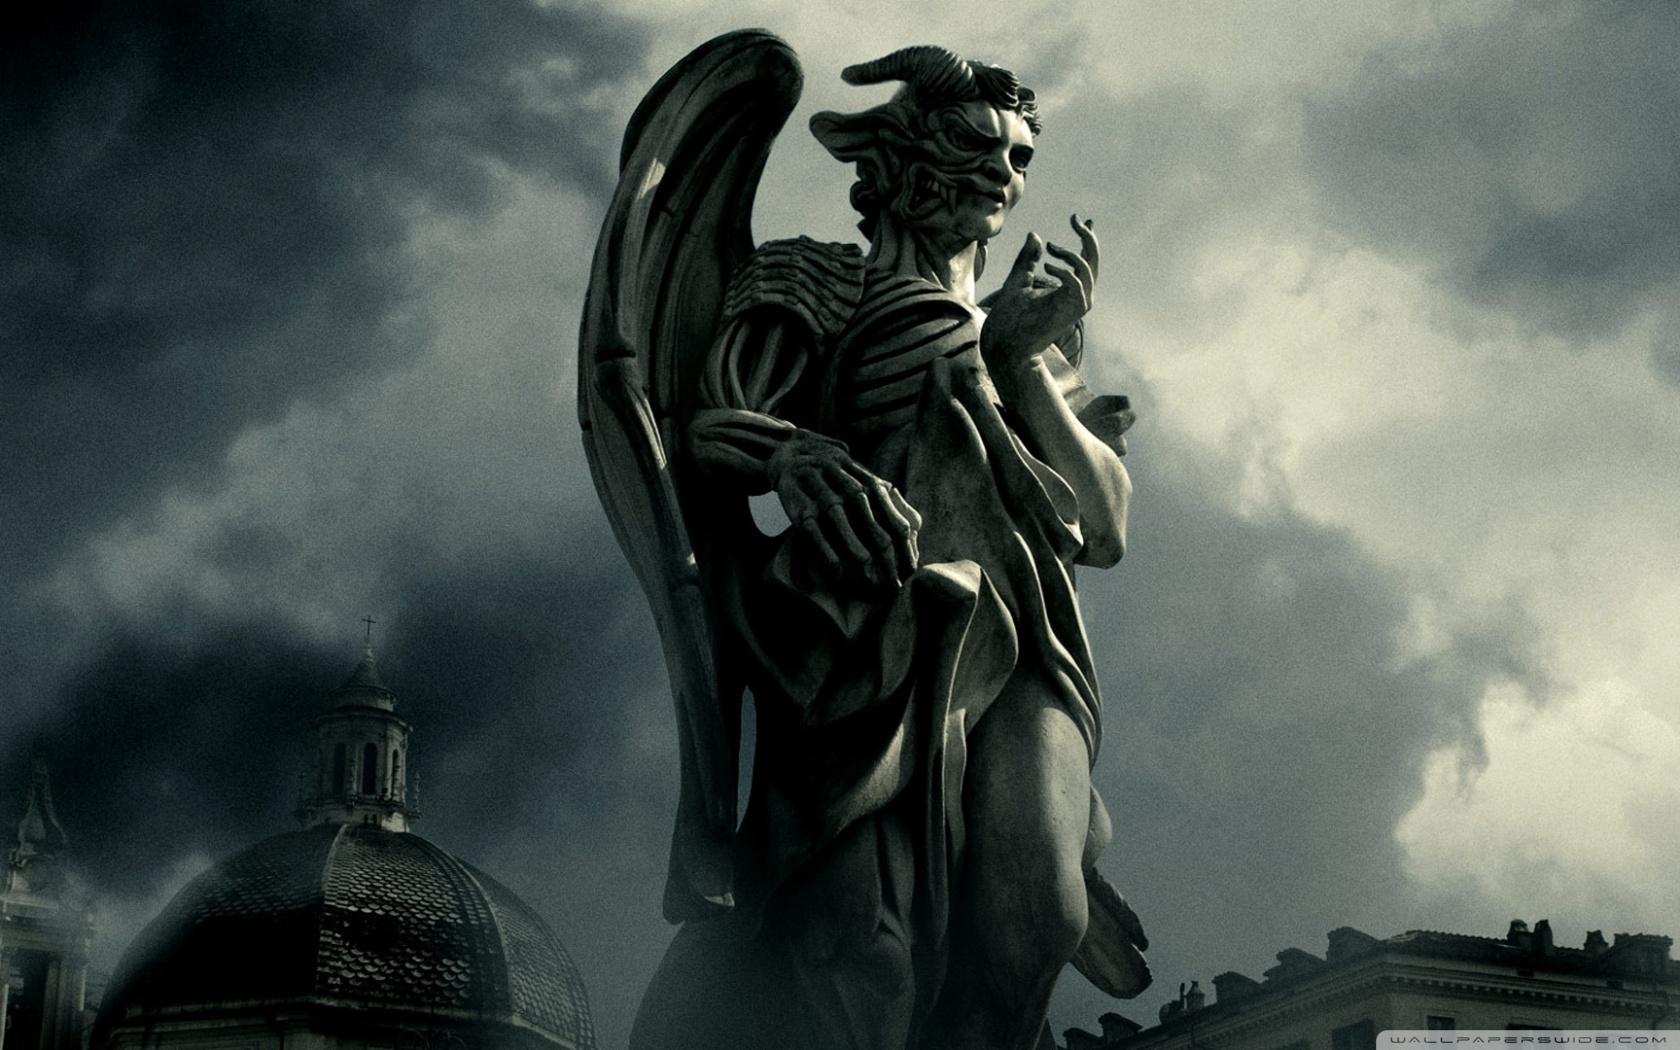 angels and demons movie ❤ 4k hd desktop wallpaper for 4k ultra hd